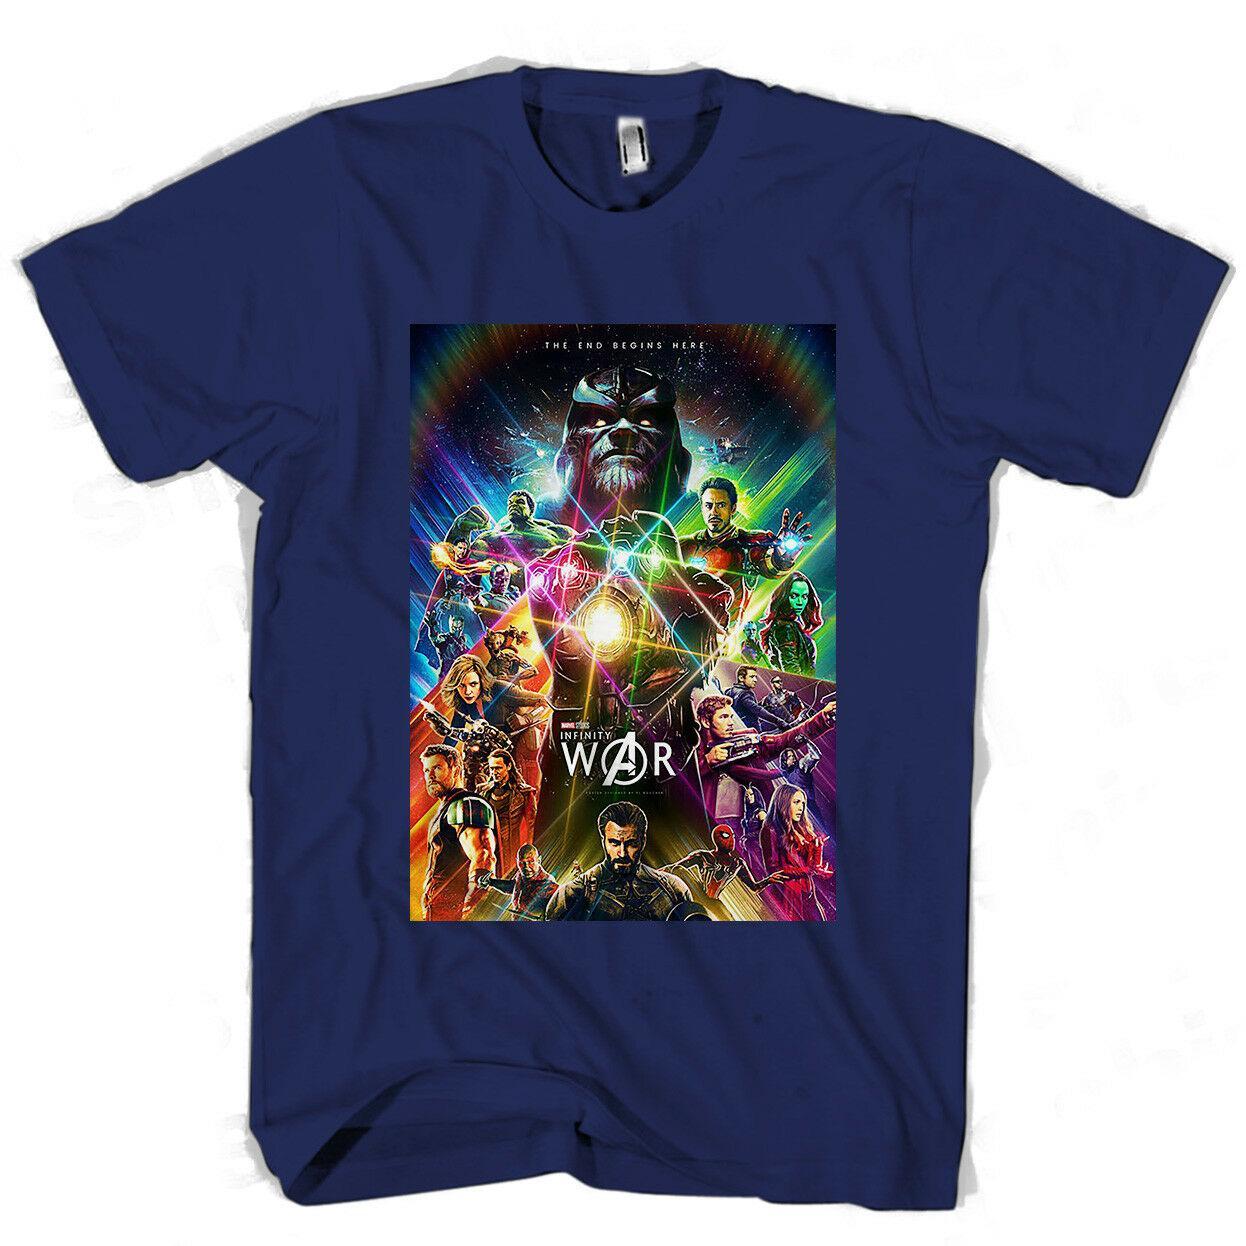 Infinity War Concept Art Poster Men S Women S T Shirt Funny Free Shipping Unisex Casual Tshirt Top